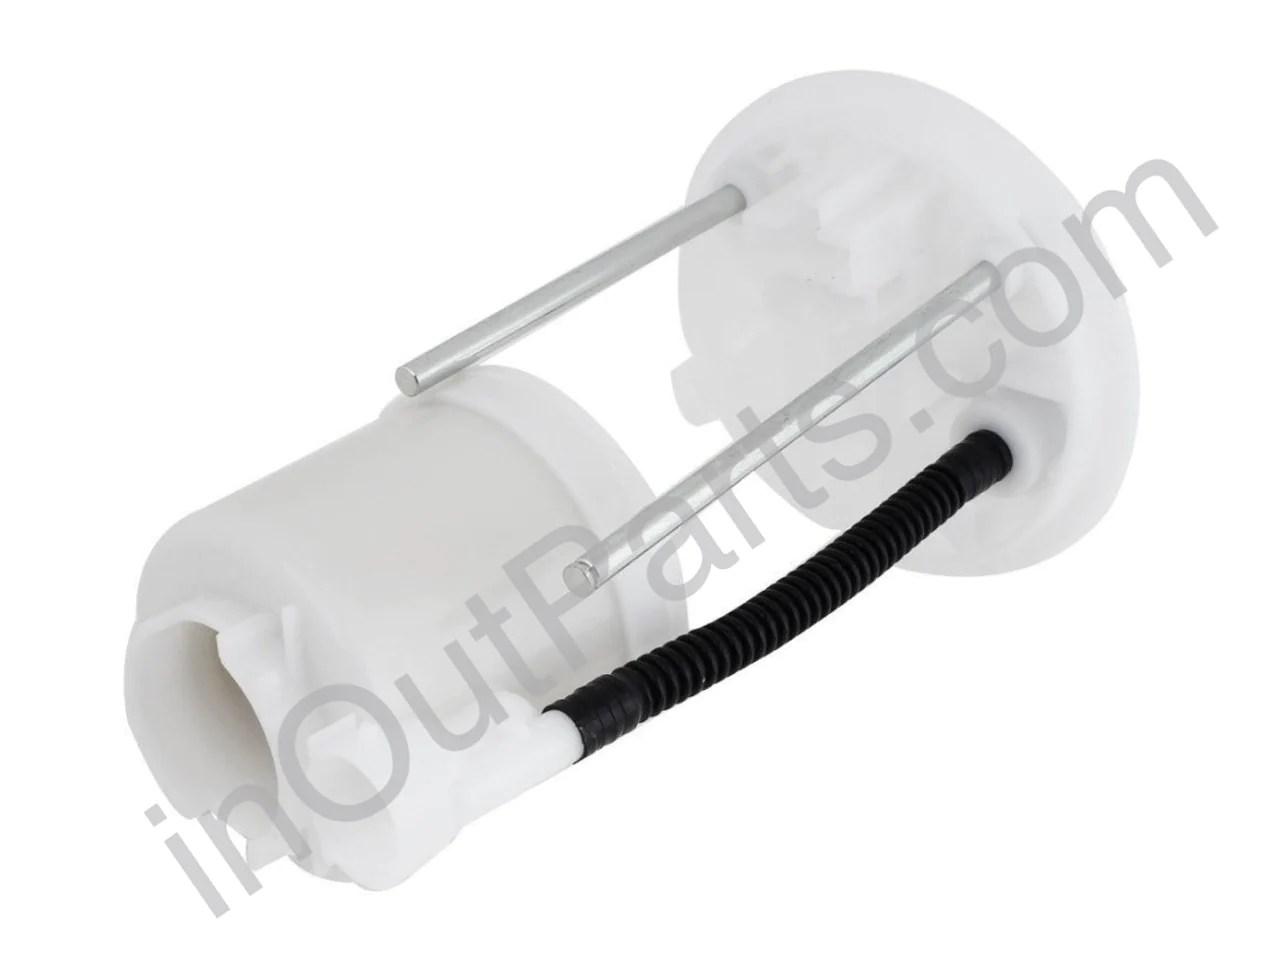 hight resolution of  fuel filter toyota camry 2azfe 2006 2007 2008 2009 2010 2011 2012 2013 2014 2015 2016